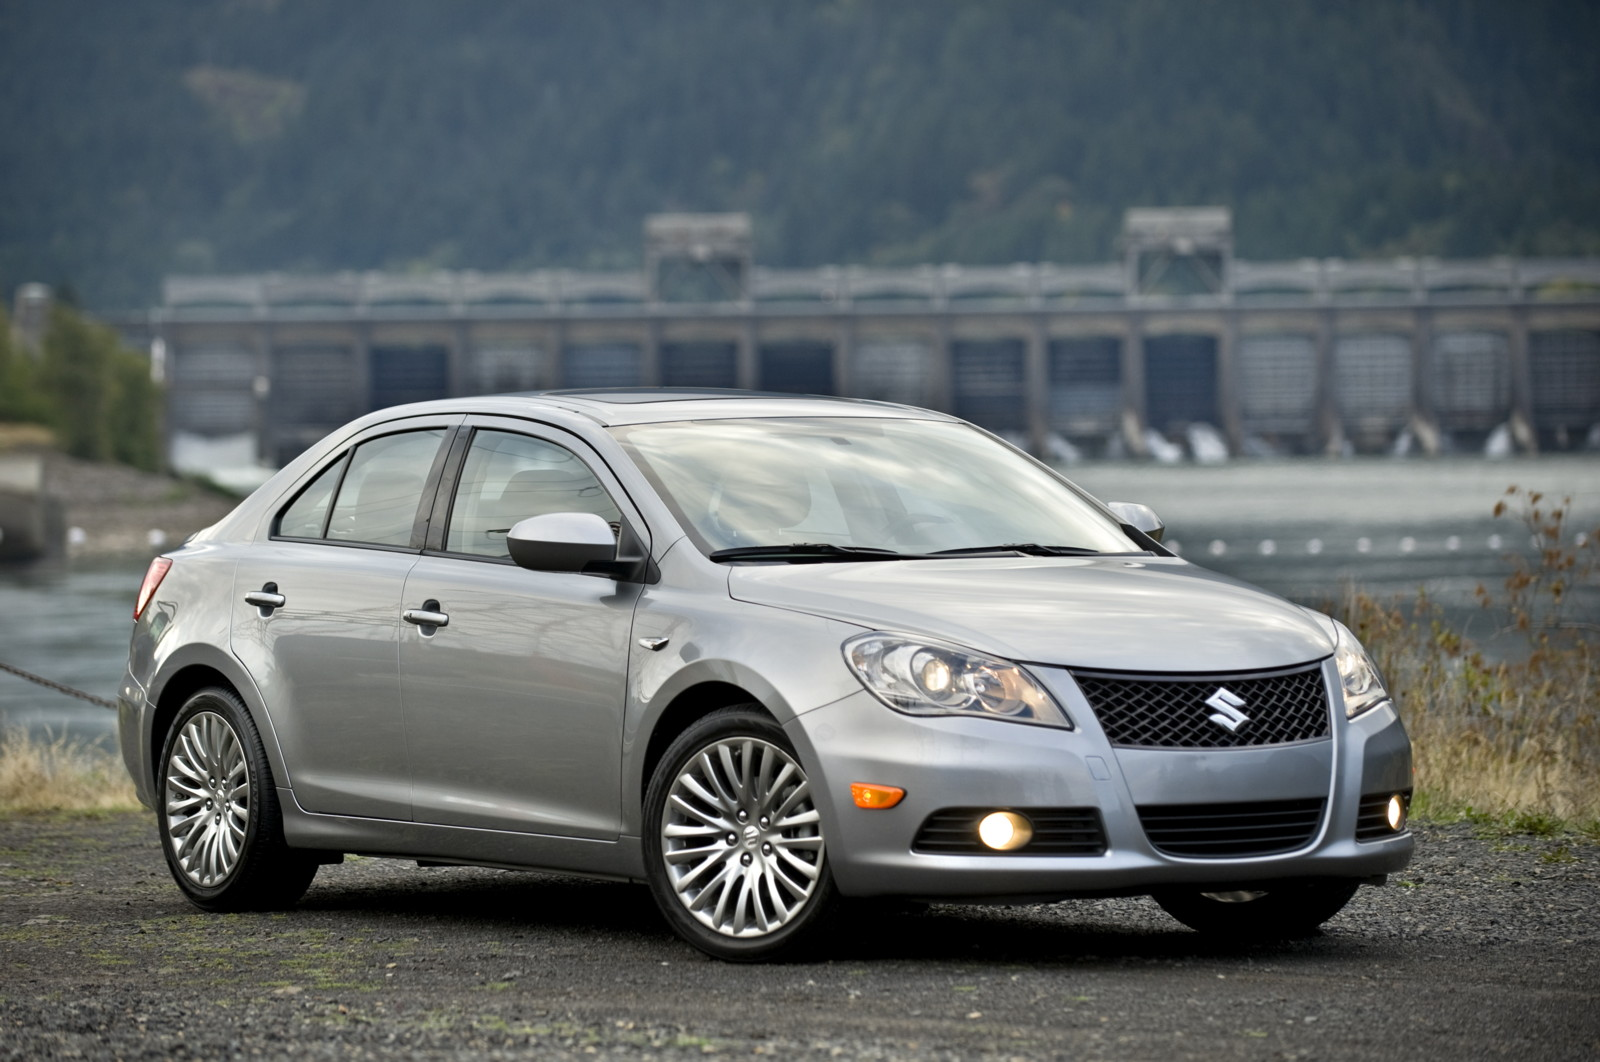 updated: suzuki recalls over 5,100 kizashi sedans